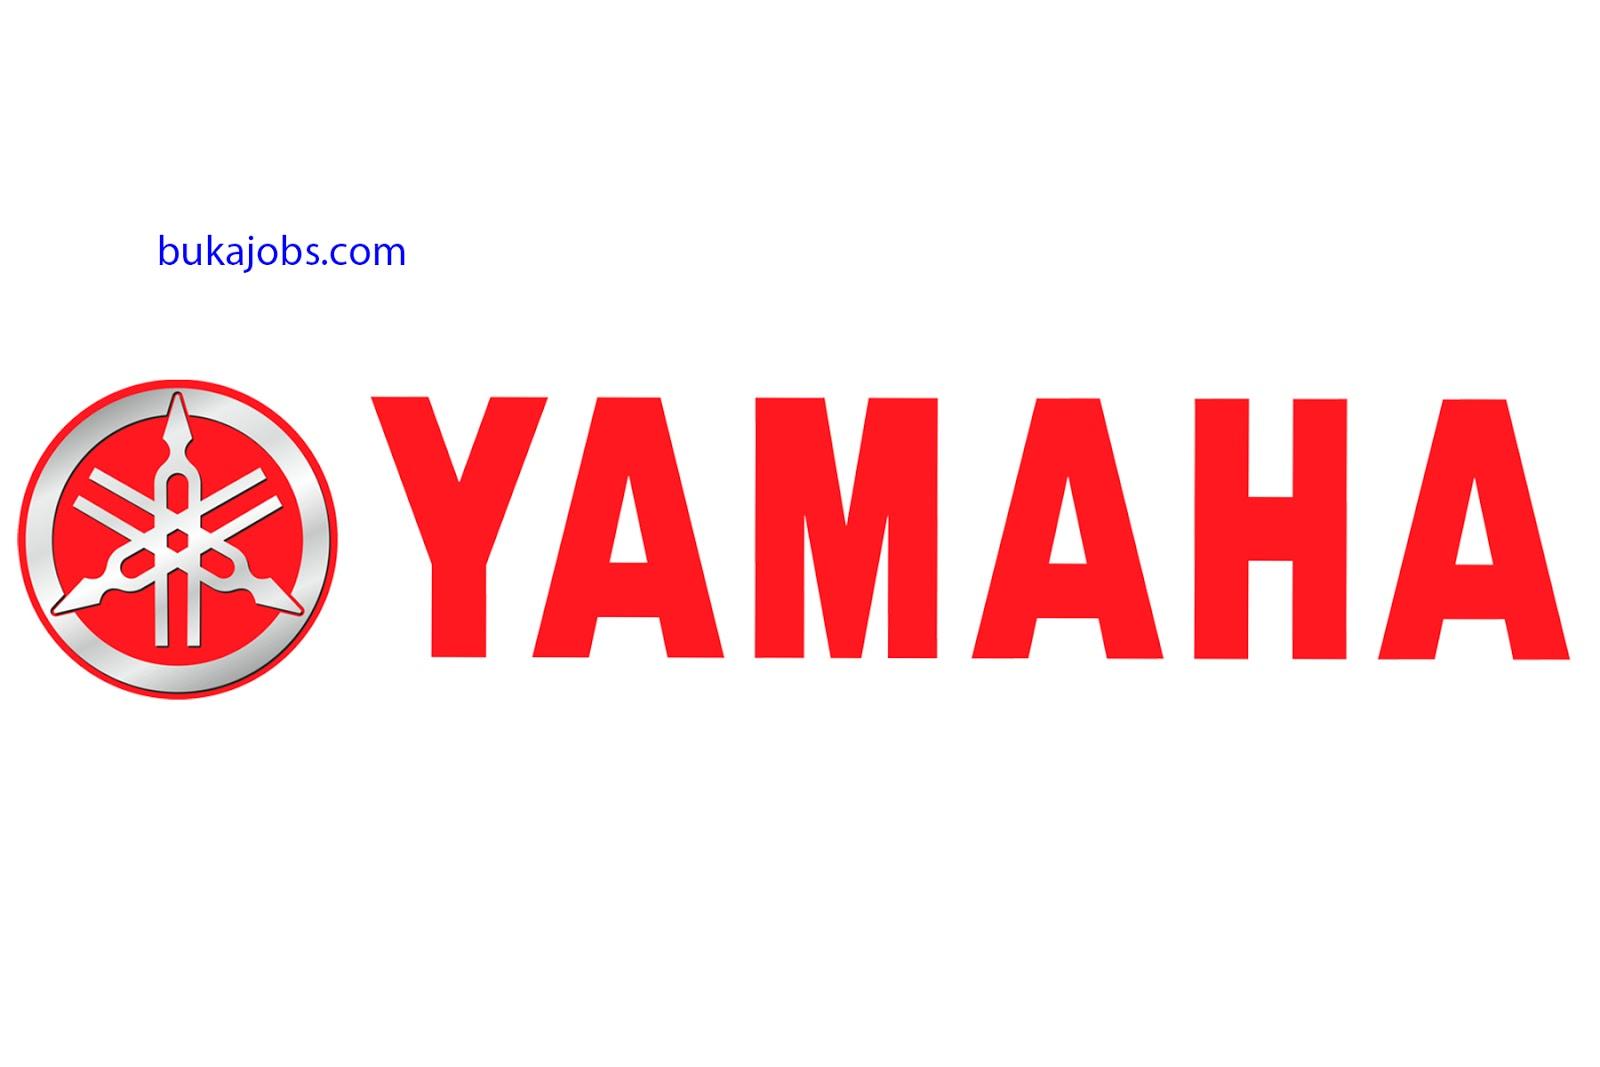 Lowongan Kerja Pt Yamaha Indonesia Motor Manufacturing 2021 Bukajobs Com